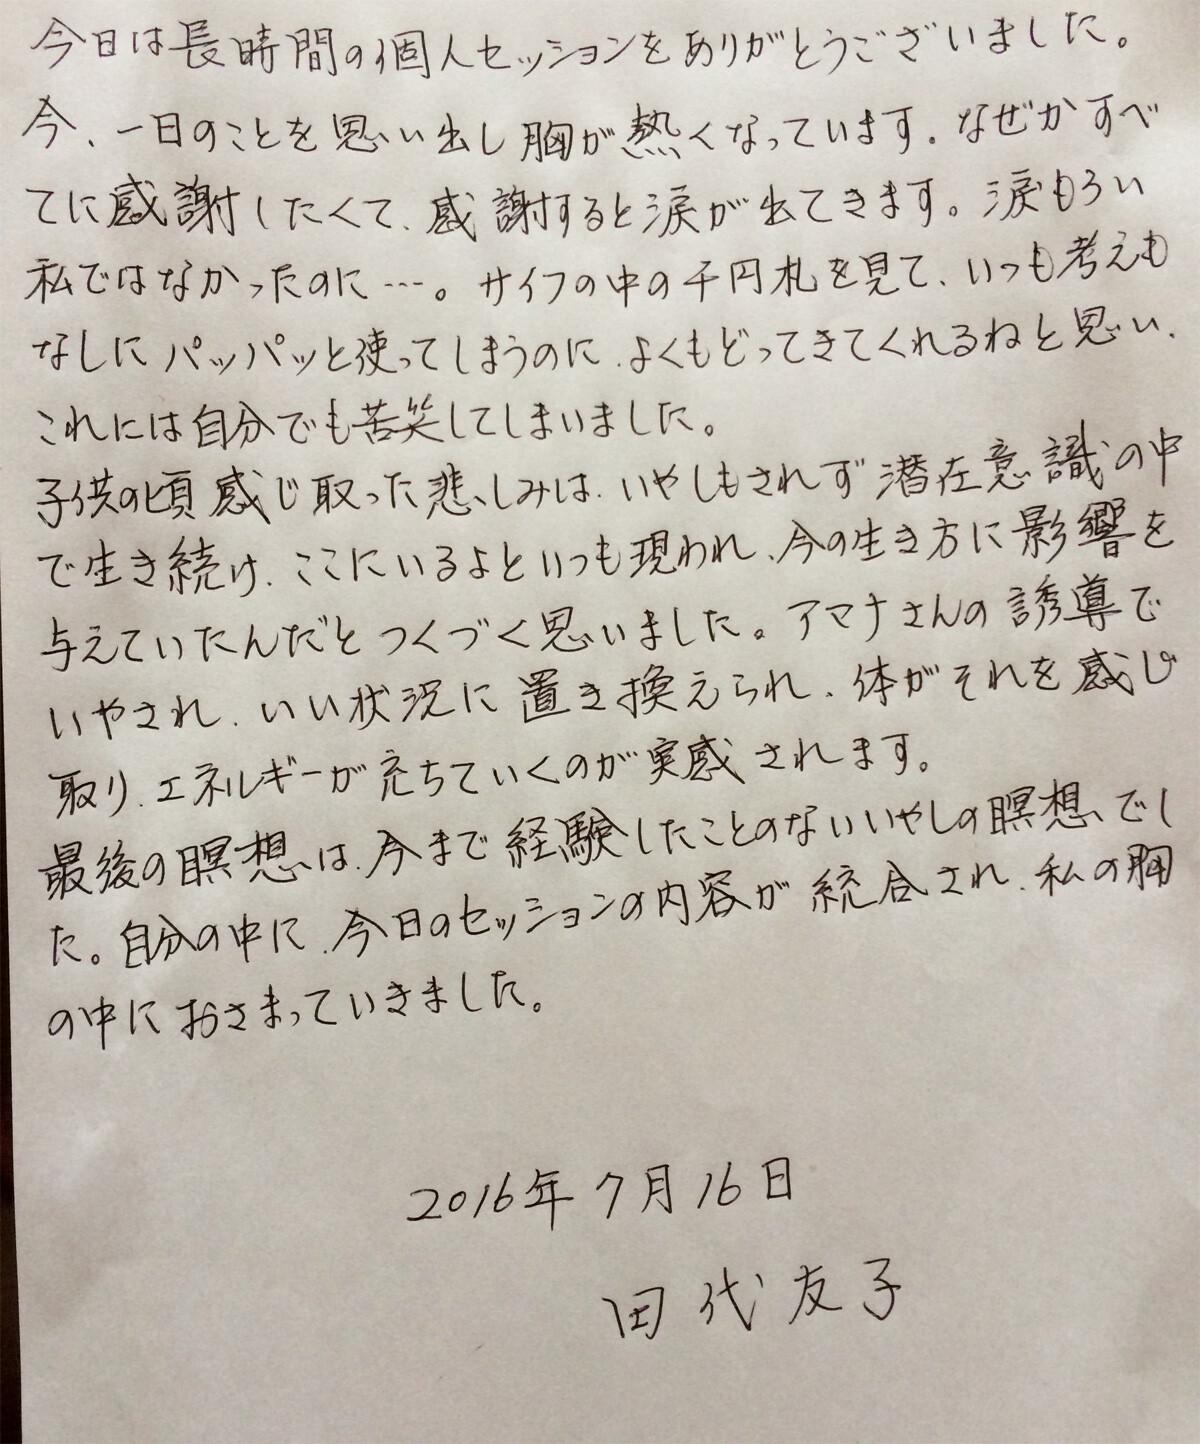 160716_Tashiro